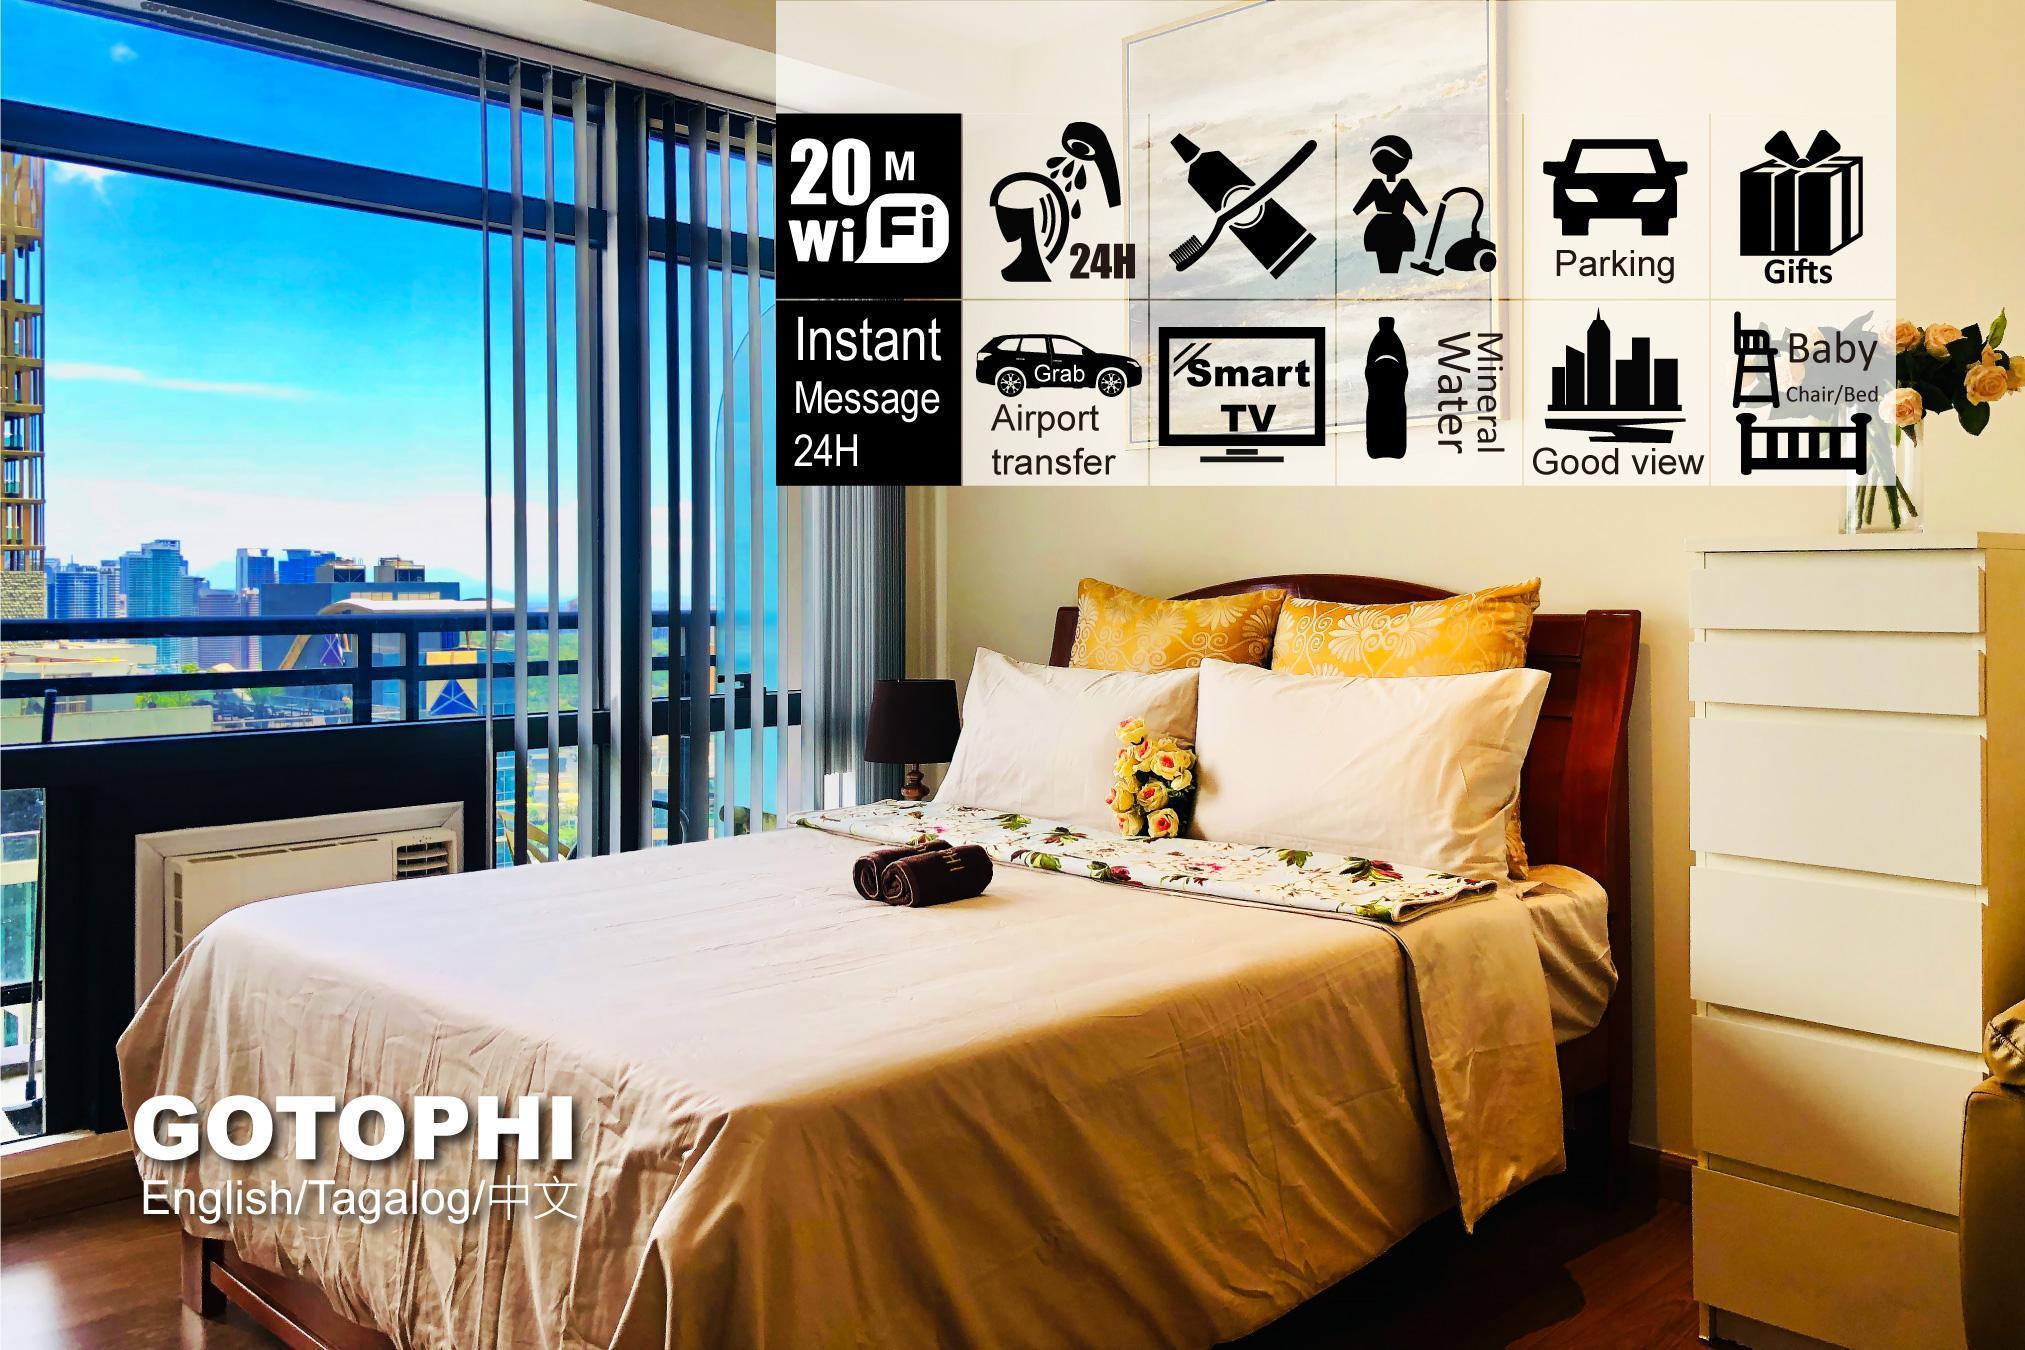 Gotophi Luxurious 5Star hotel Gramercy Makati 3906